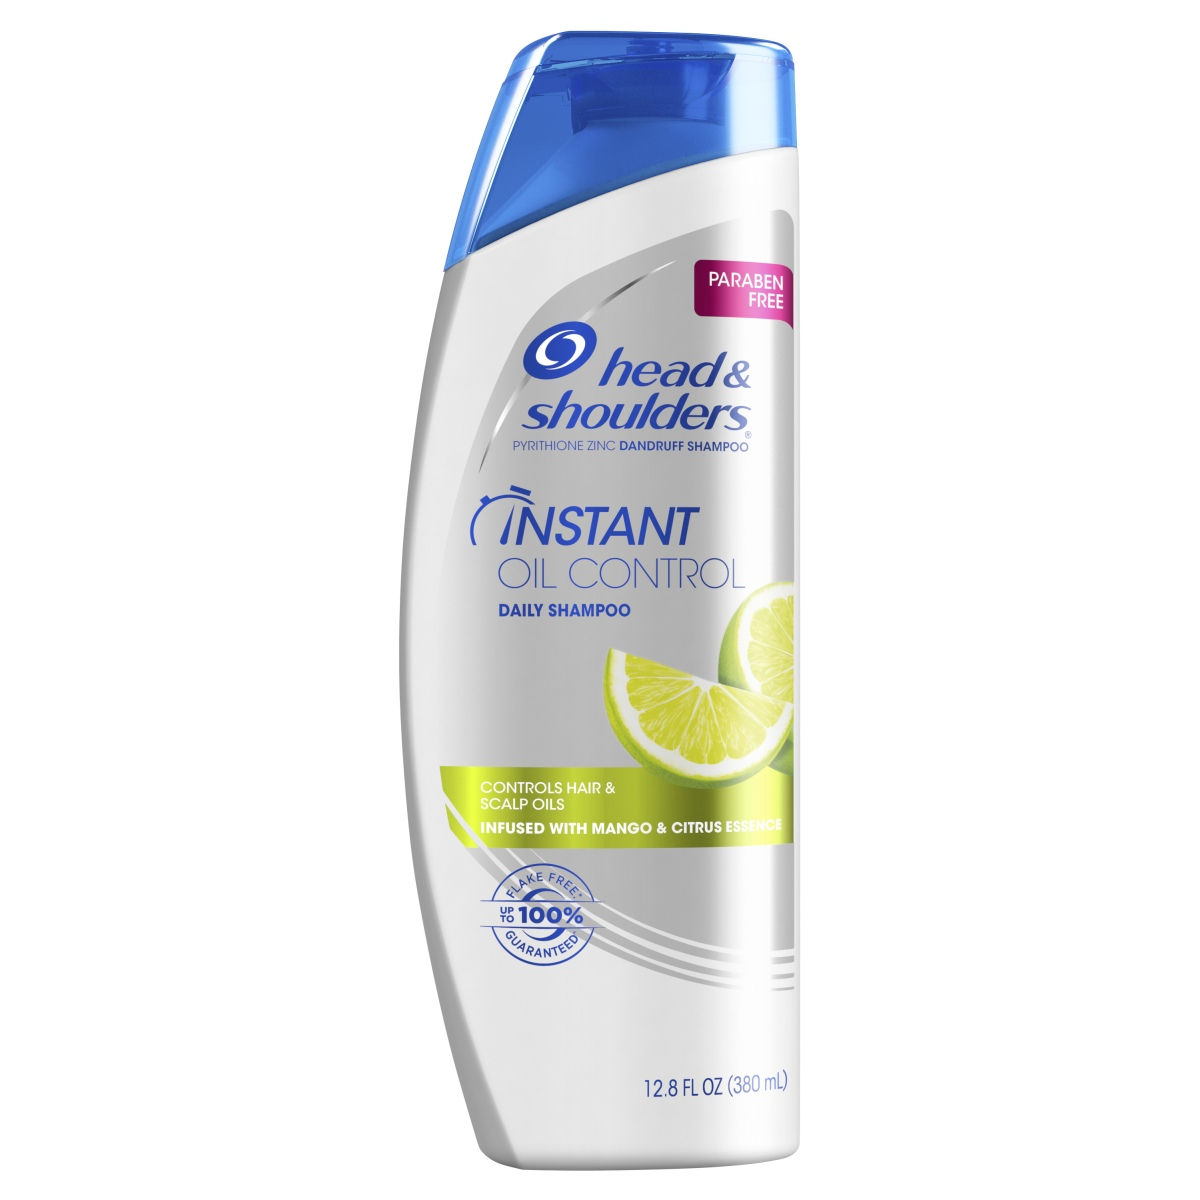 Head & Shoulders Instant Oil Control Anti-Dandruff Shampoo